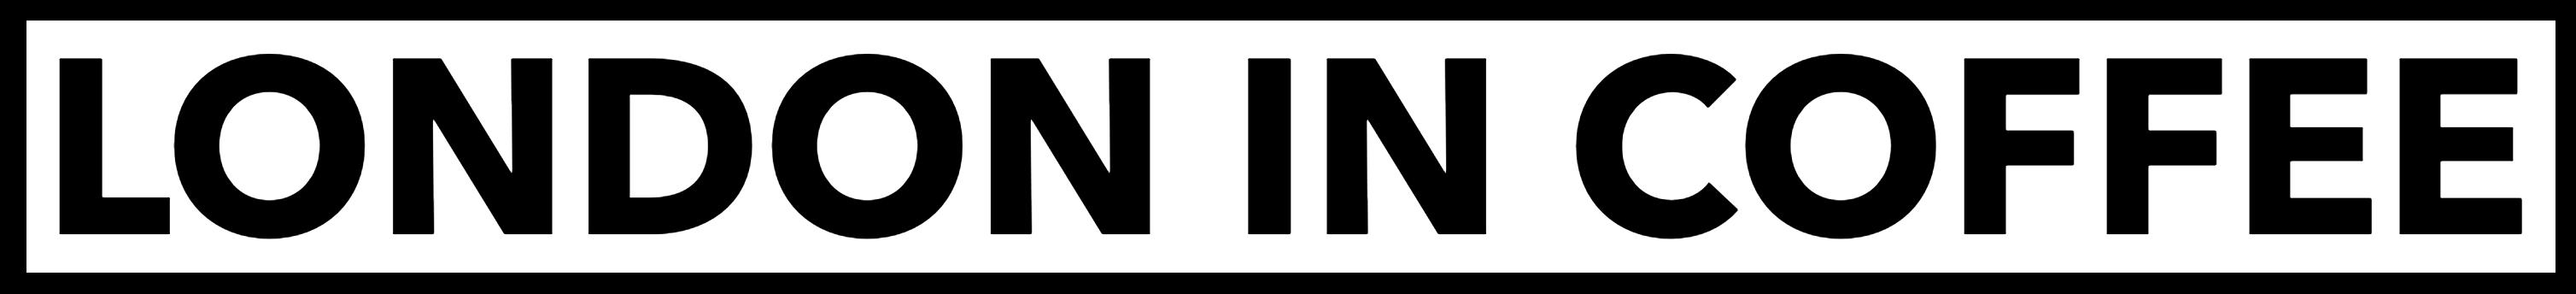 London in Coffee Logo